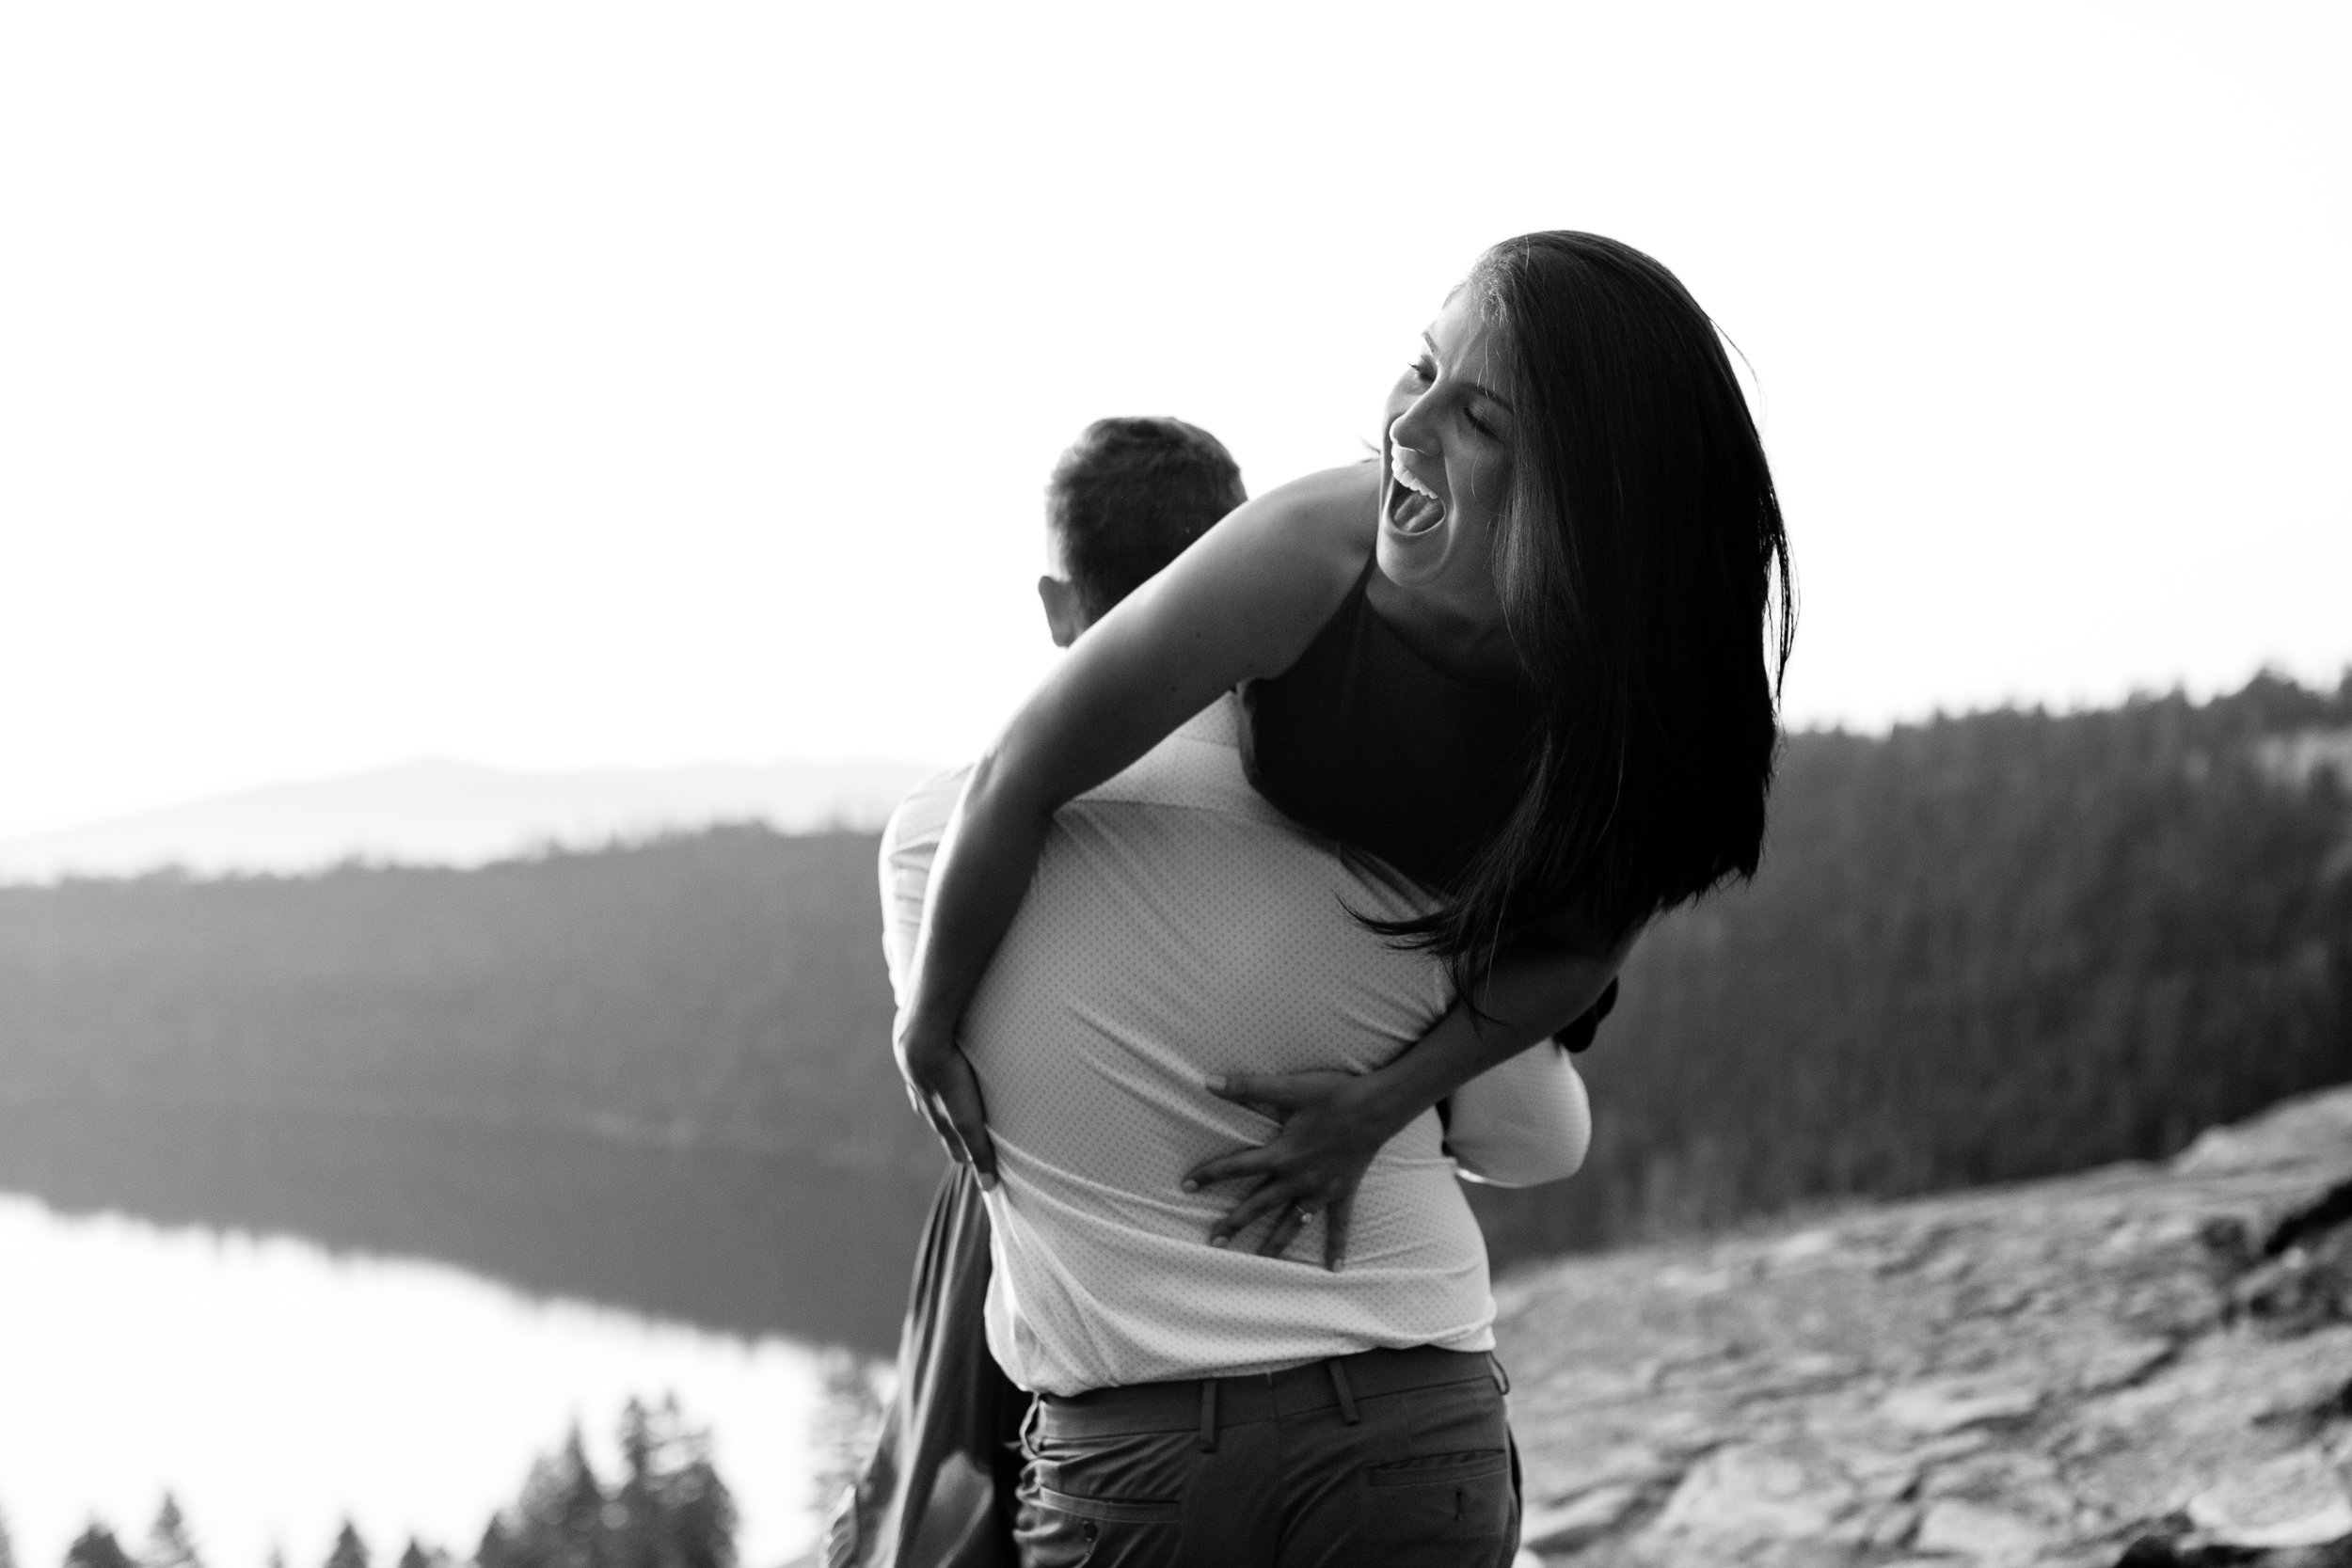 nicole-daacke-photography-lake-tahoe-sunrise-summer-adventure-engagement-photos-nevada-wedding-elopement-photographer-golden-emerald-bay-light-pine-trees-summer-vibe-fun-carefree-authentic-love-29.jpg